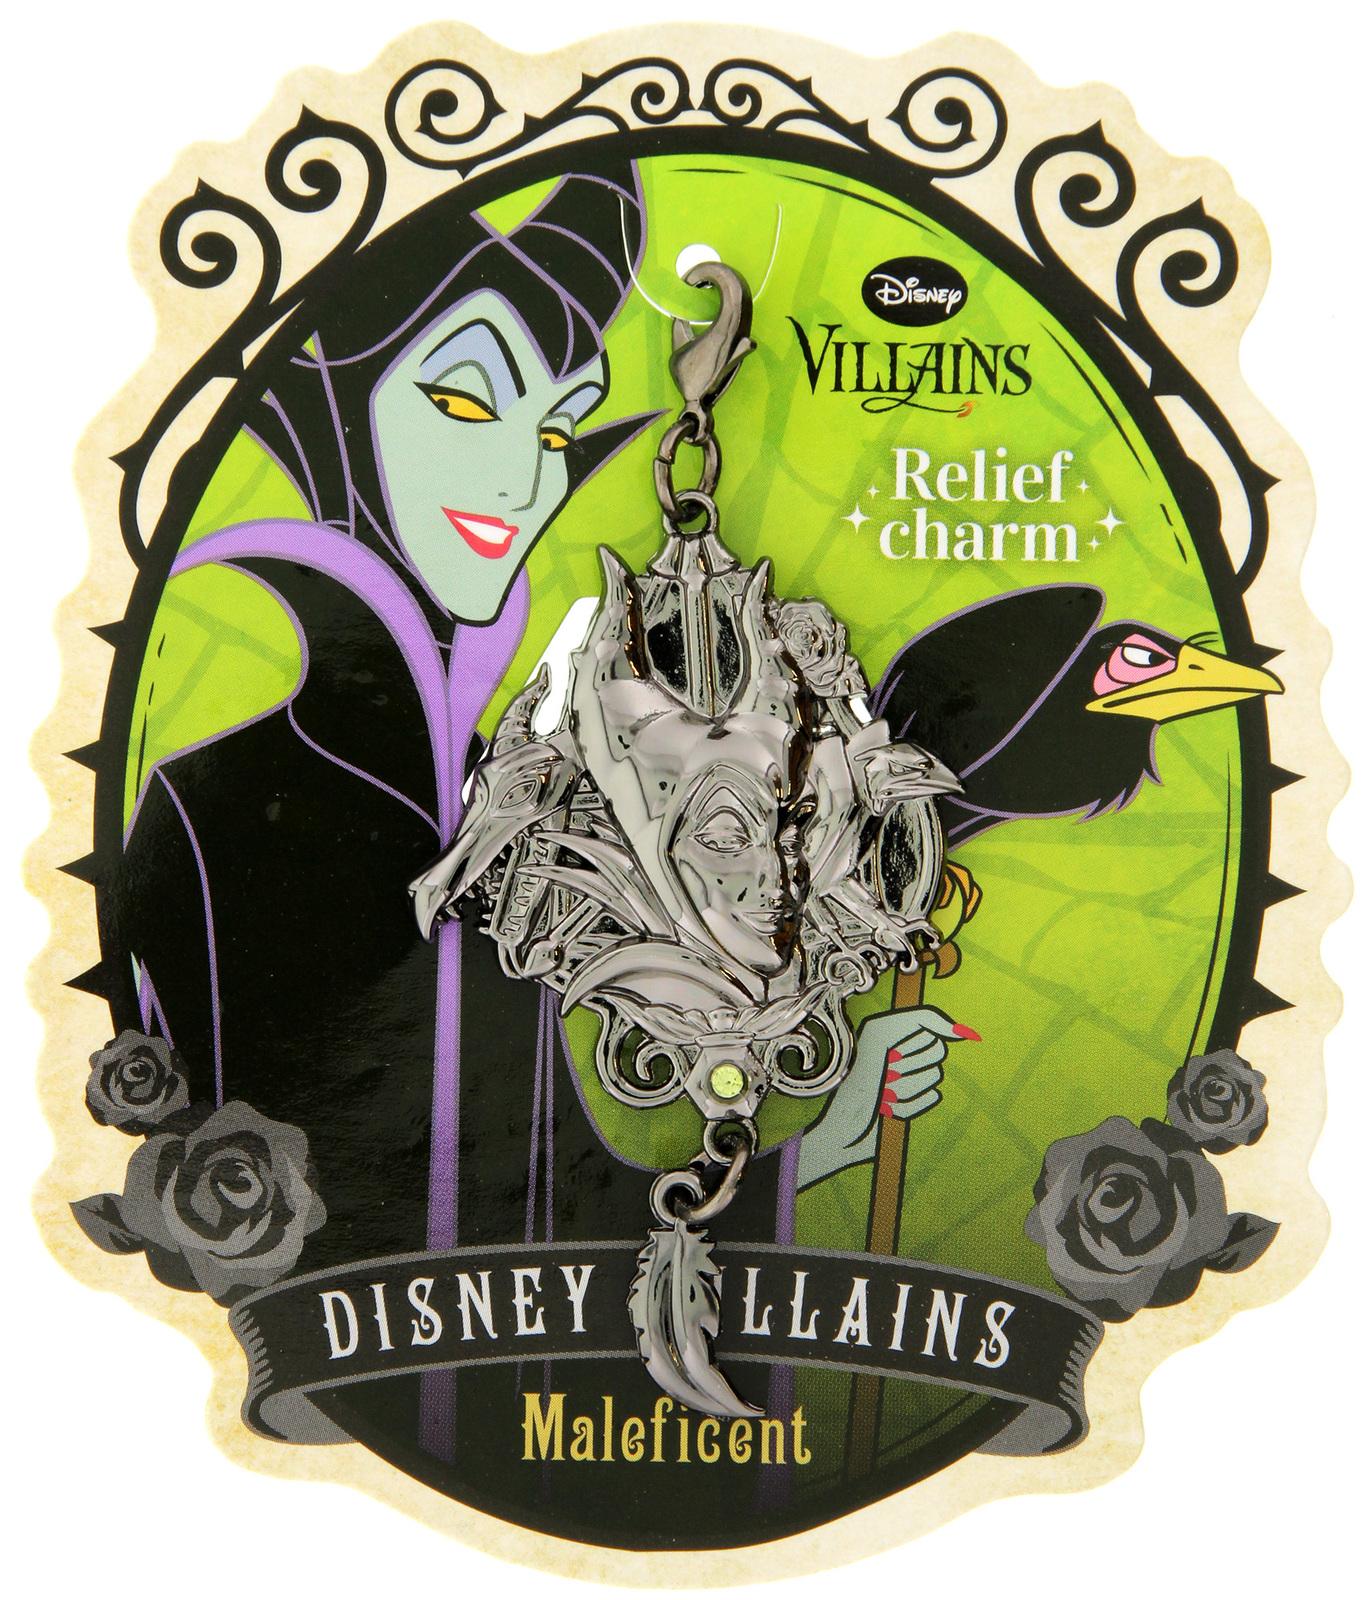 Disney Villains Bag Charm - Maleficent image